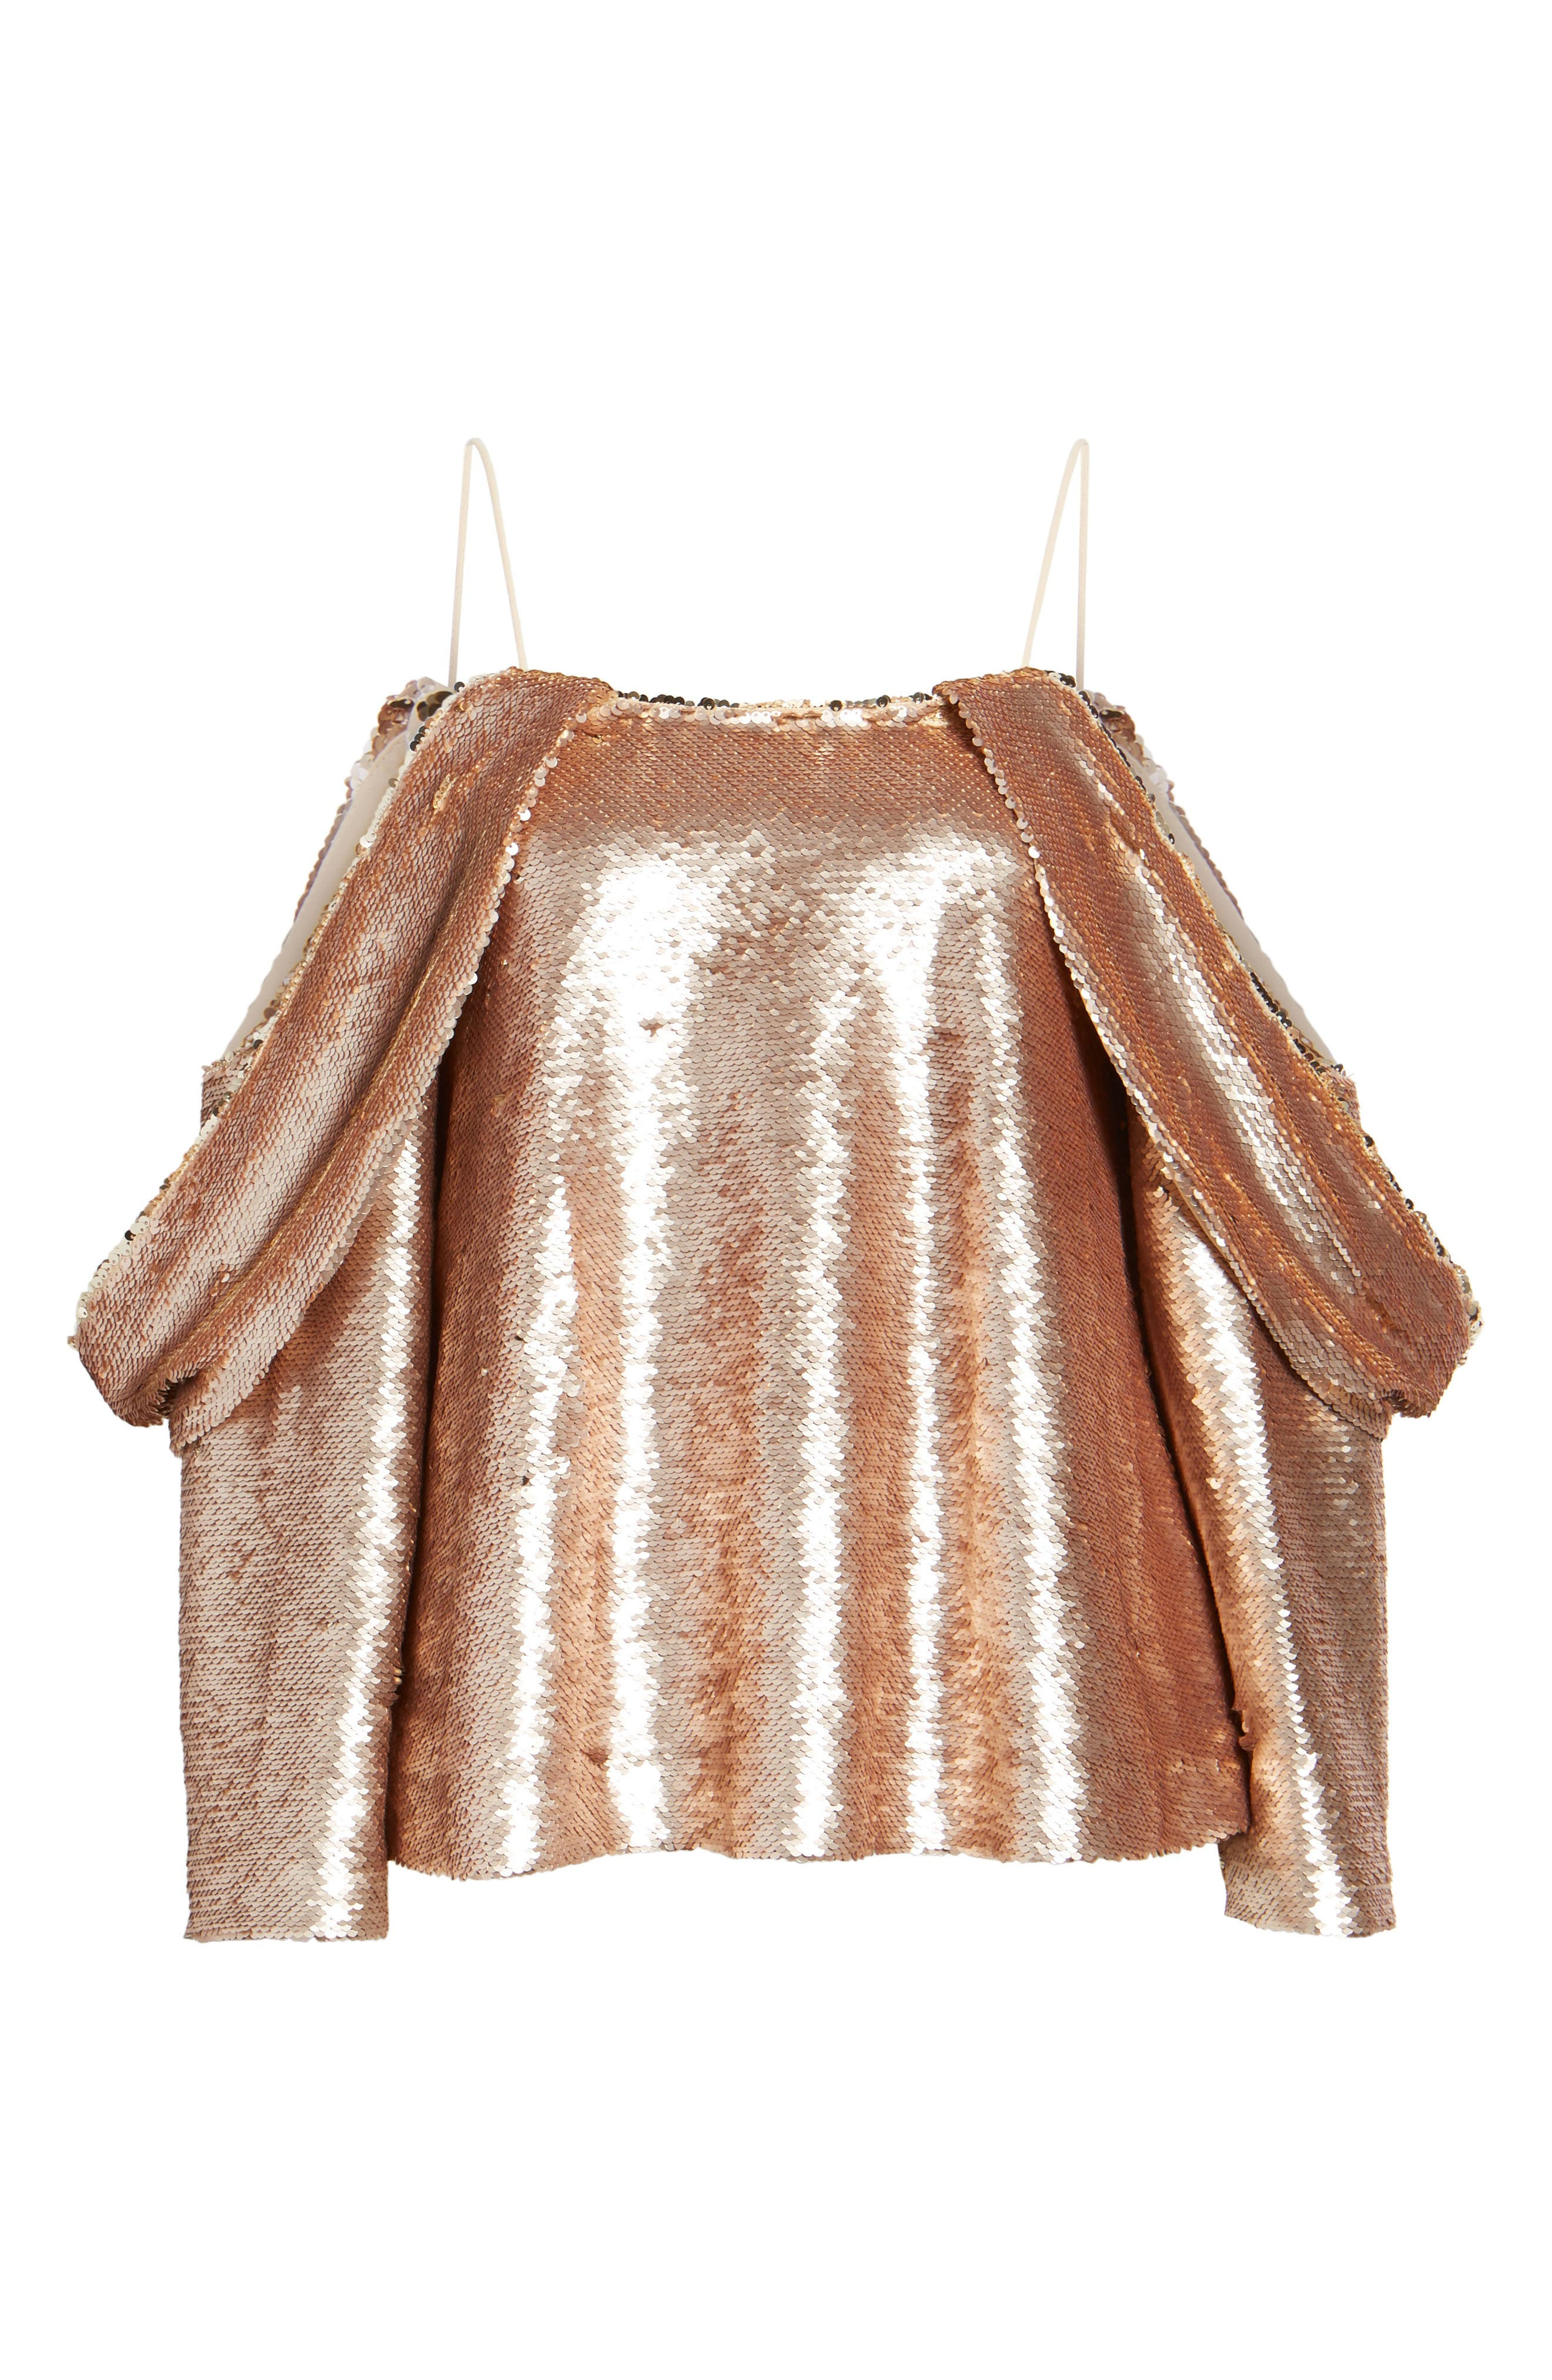 Revolution Off the Shoulder Sequin Top,                             Alternate thumbnail 6, color,                             Champagne Blush